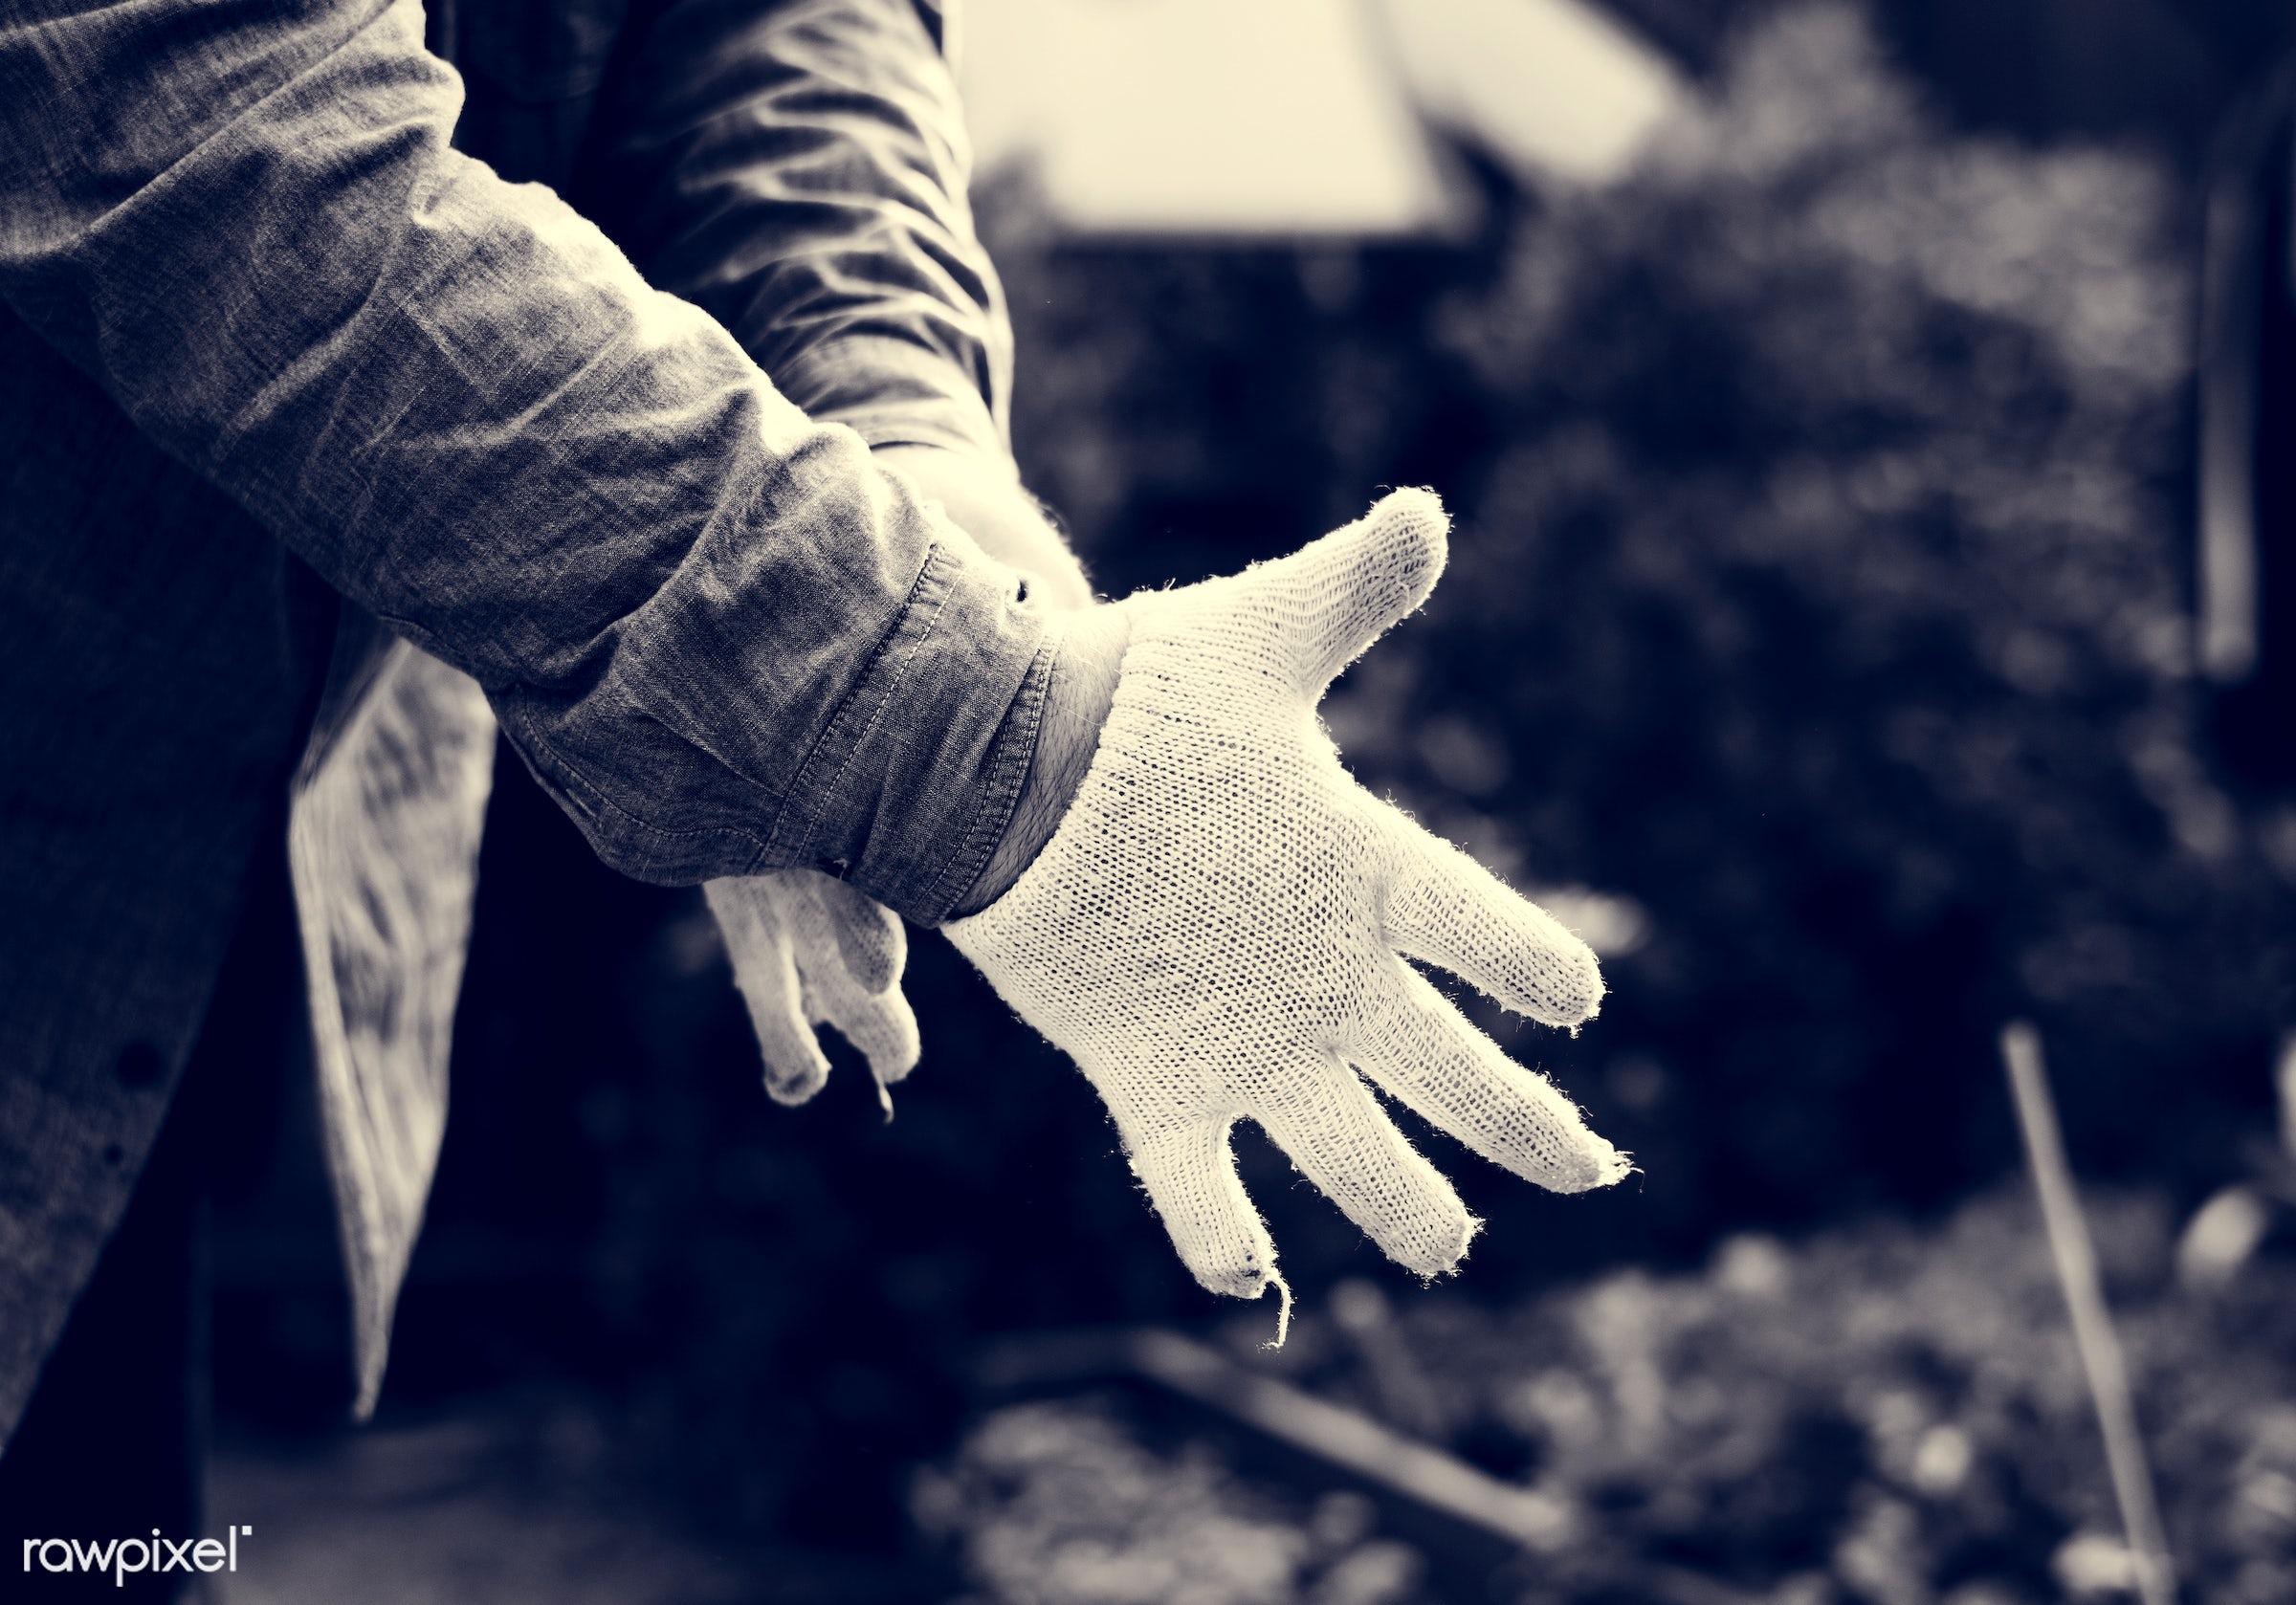 plant, person, holding, botany, ground, botanical, spring, plantation, hand, farm, nature, farmer, care, cultivation, dirt,...